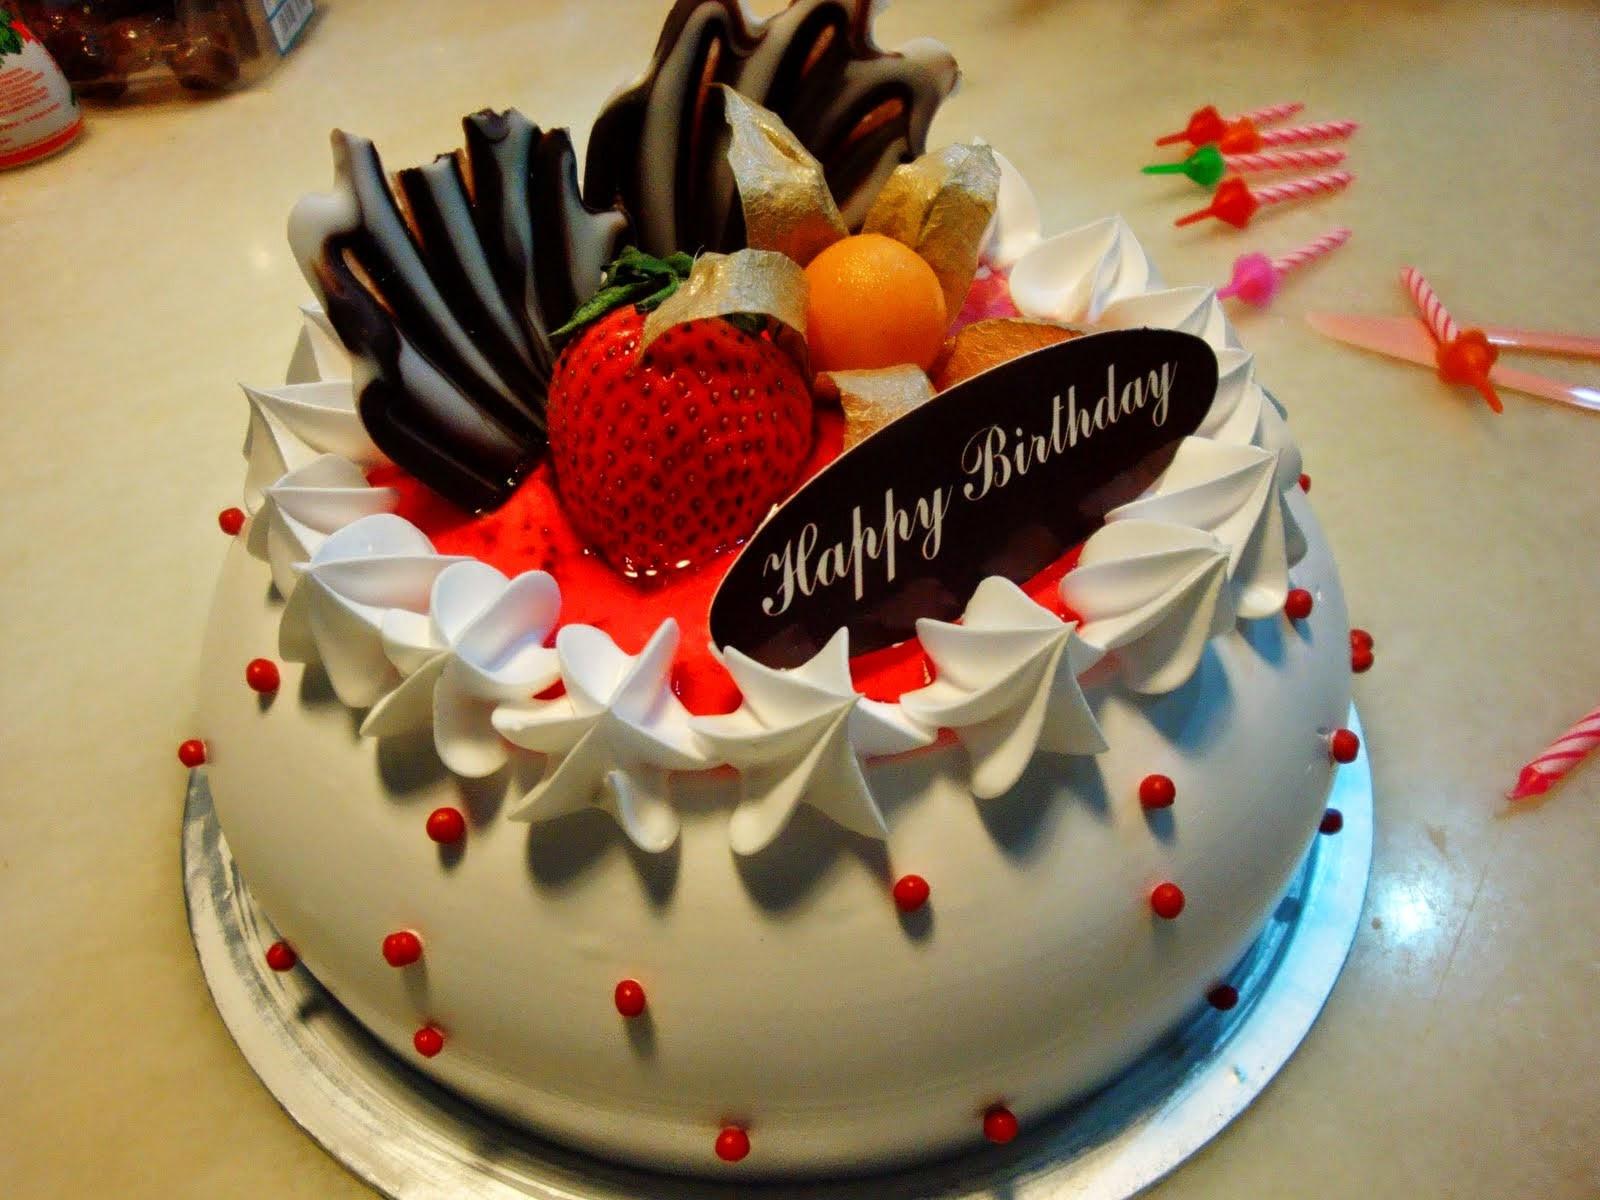 Happy Birthday Cake Image  HD BIRTHDAY WALLPAPER Birthday cakes